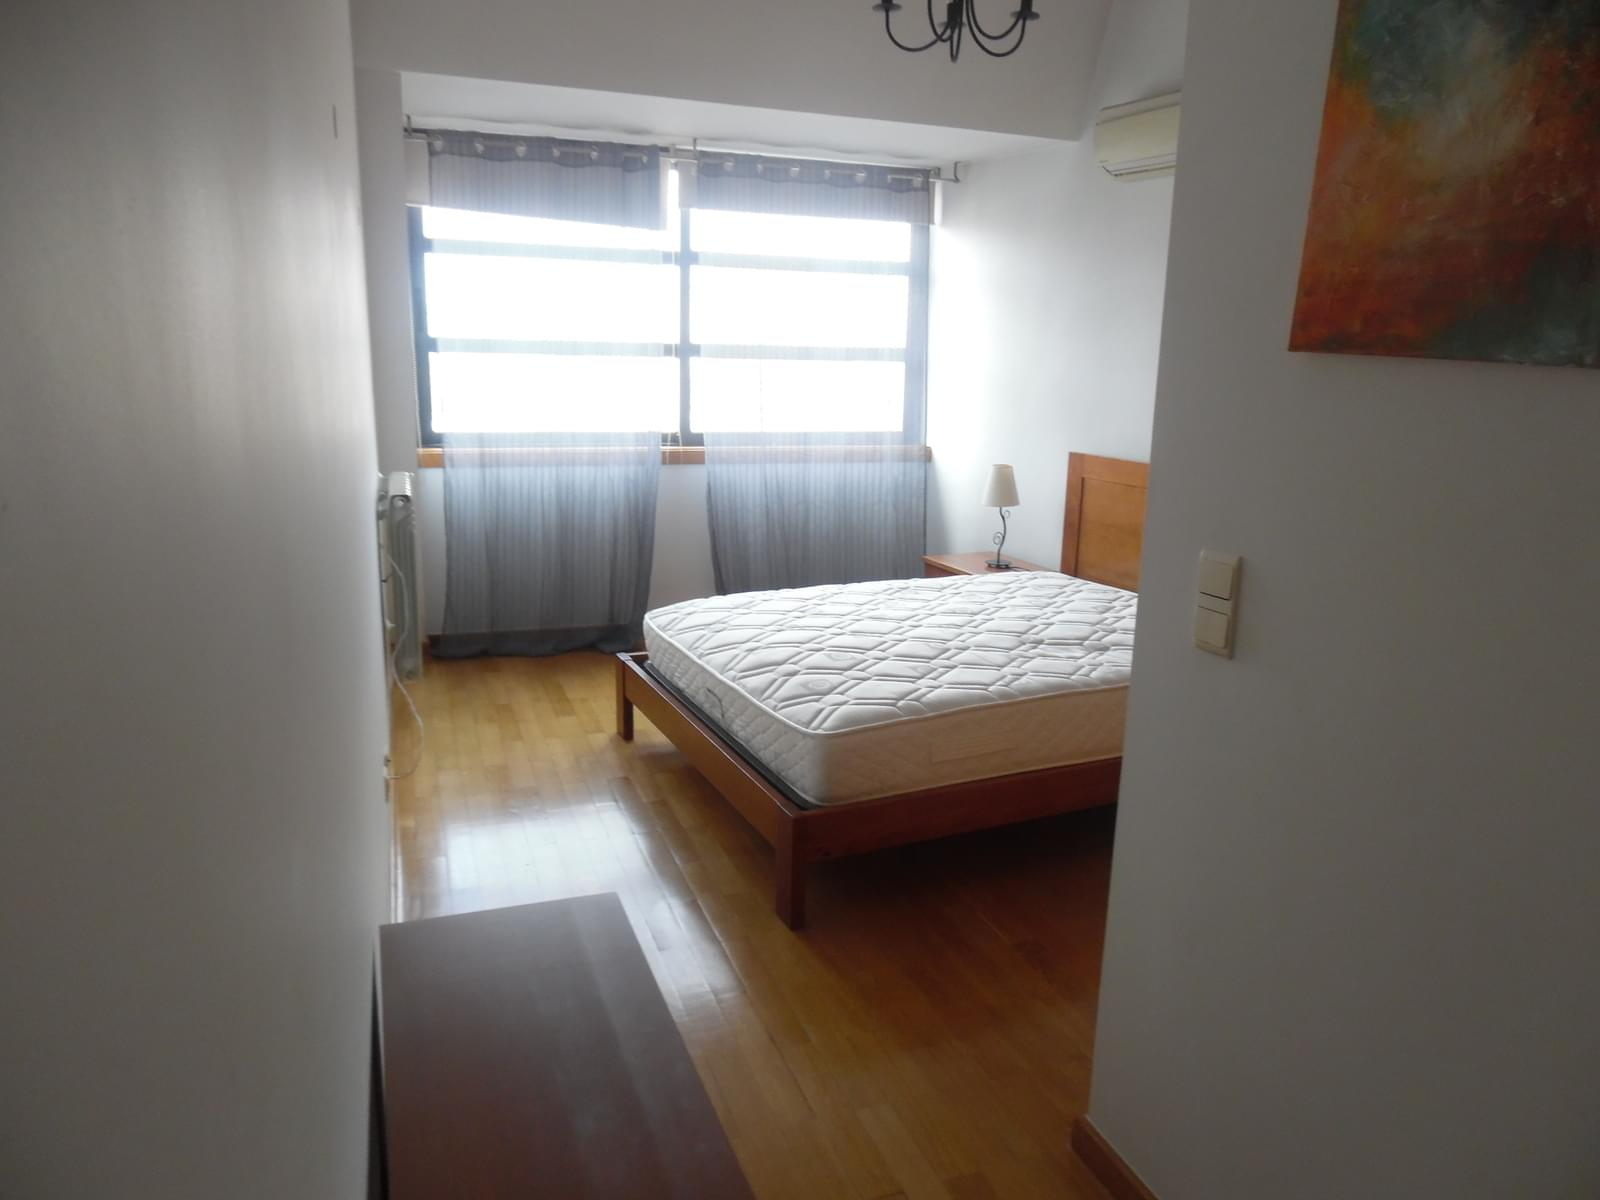 pf18329-apartamento-t1-lisboa-d5c3f068-5a8c-4a41-bd2d-8e9565feb51c